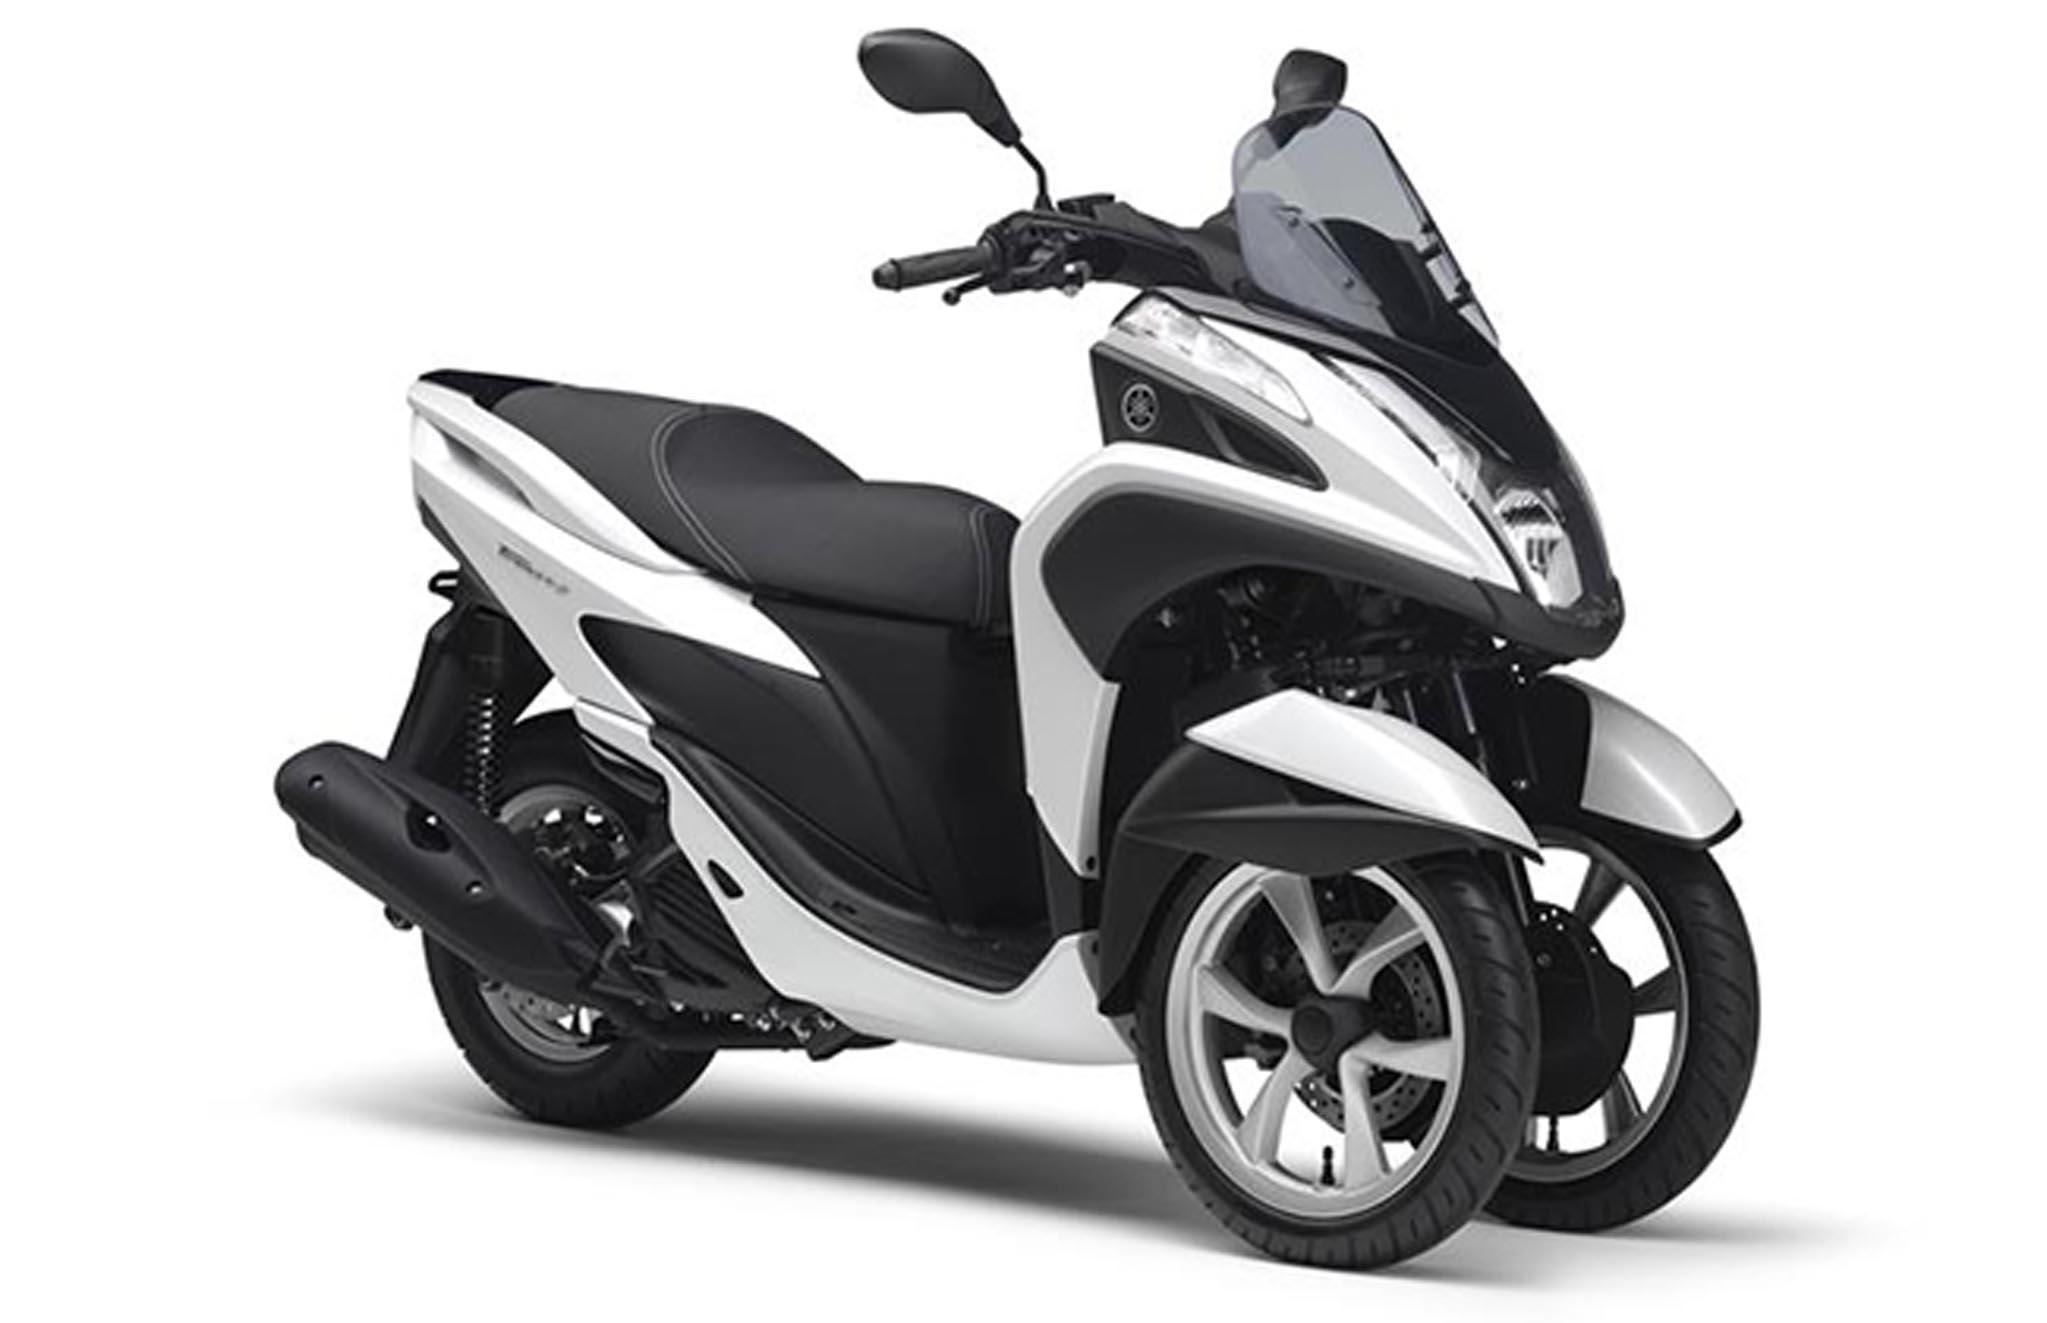 Yamaha Tricity 155 Usung Tiga Roda Berteknologi Leaning Multi-Wheel 1